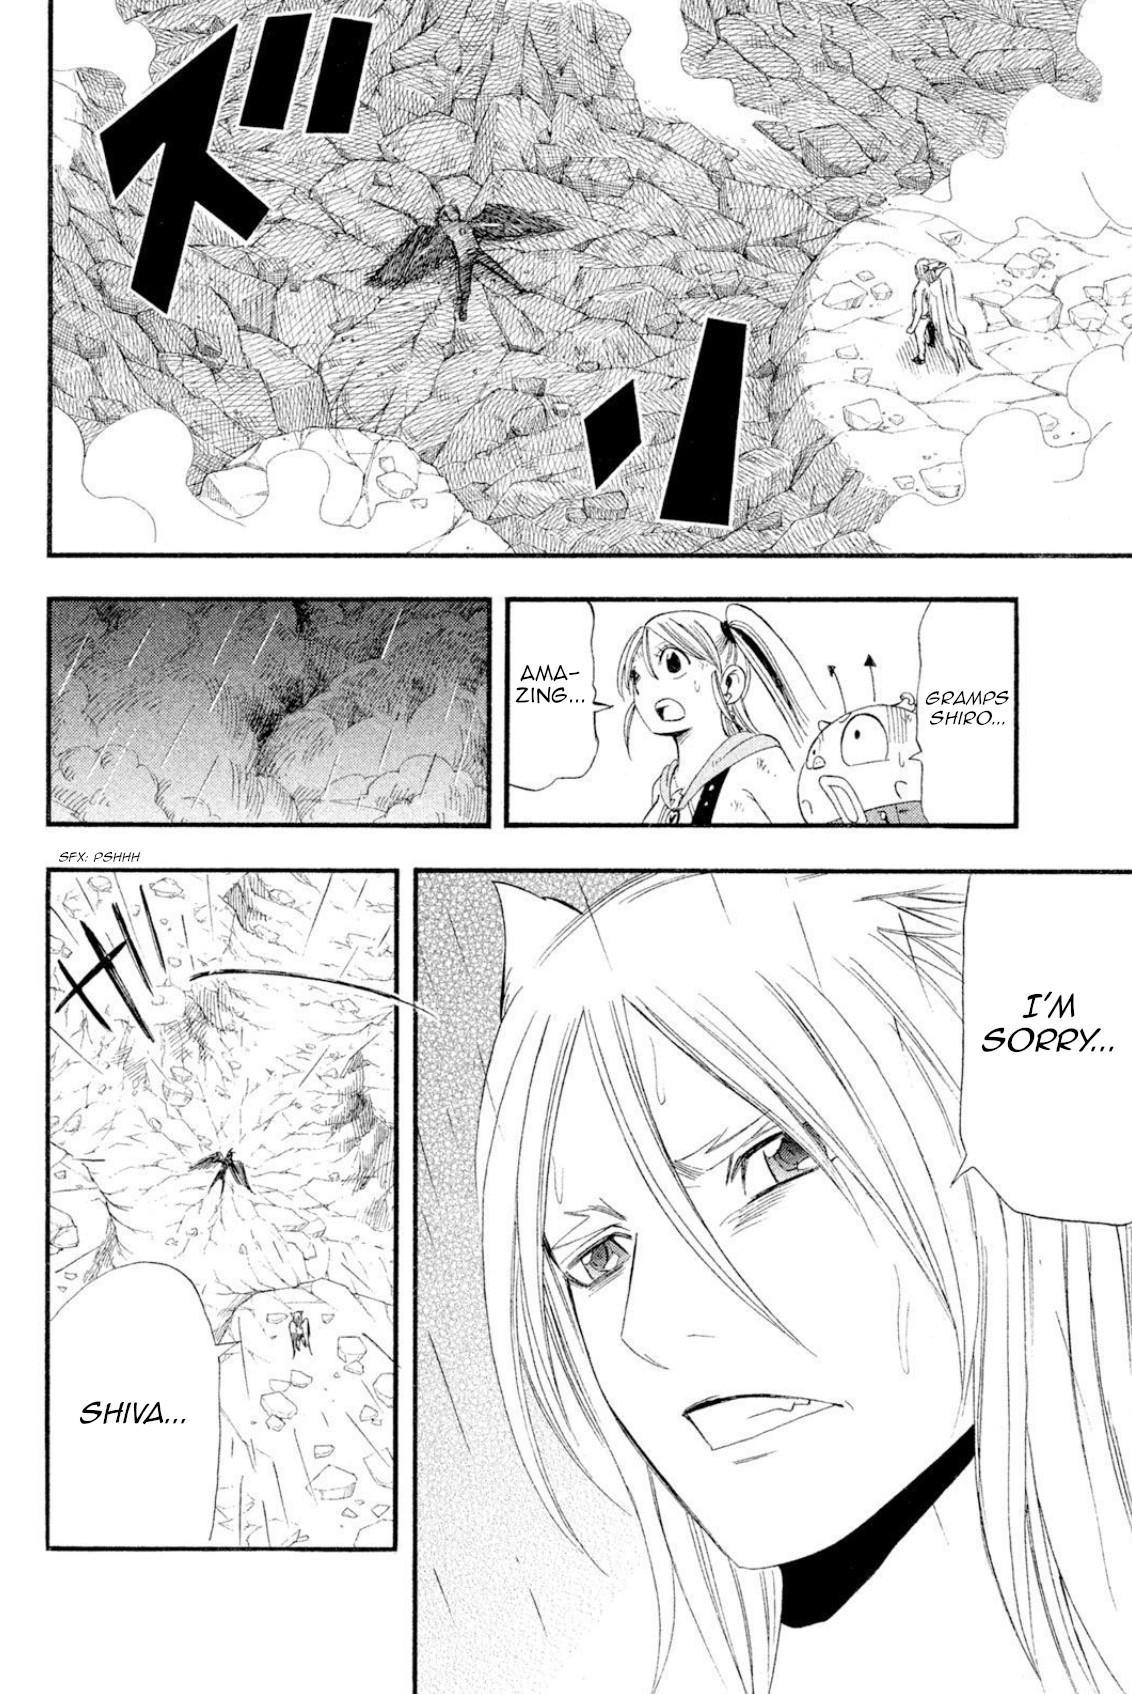 Buster Keel! Chapter 44: Shadowy Soloist (Part 2) page 30 - Mangakakalots.com